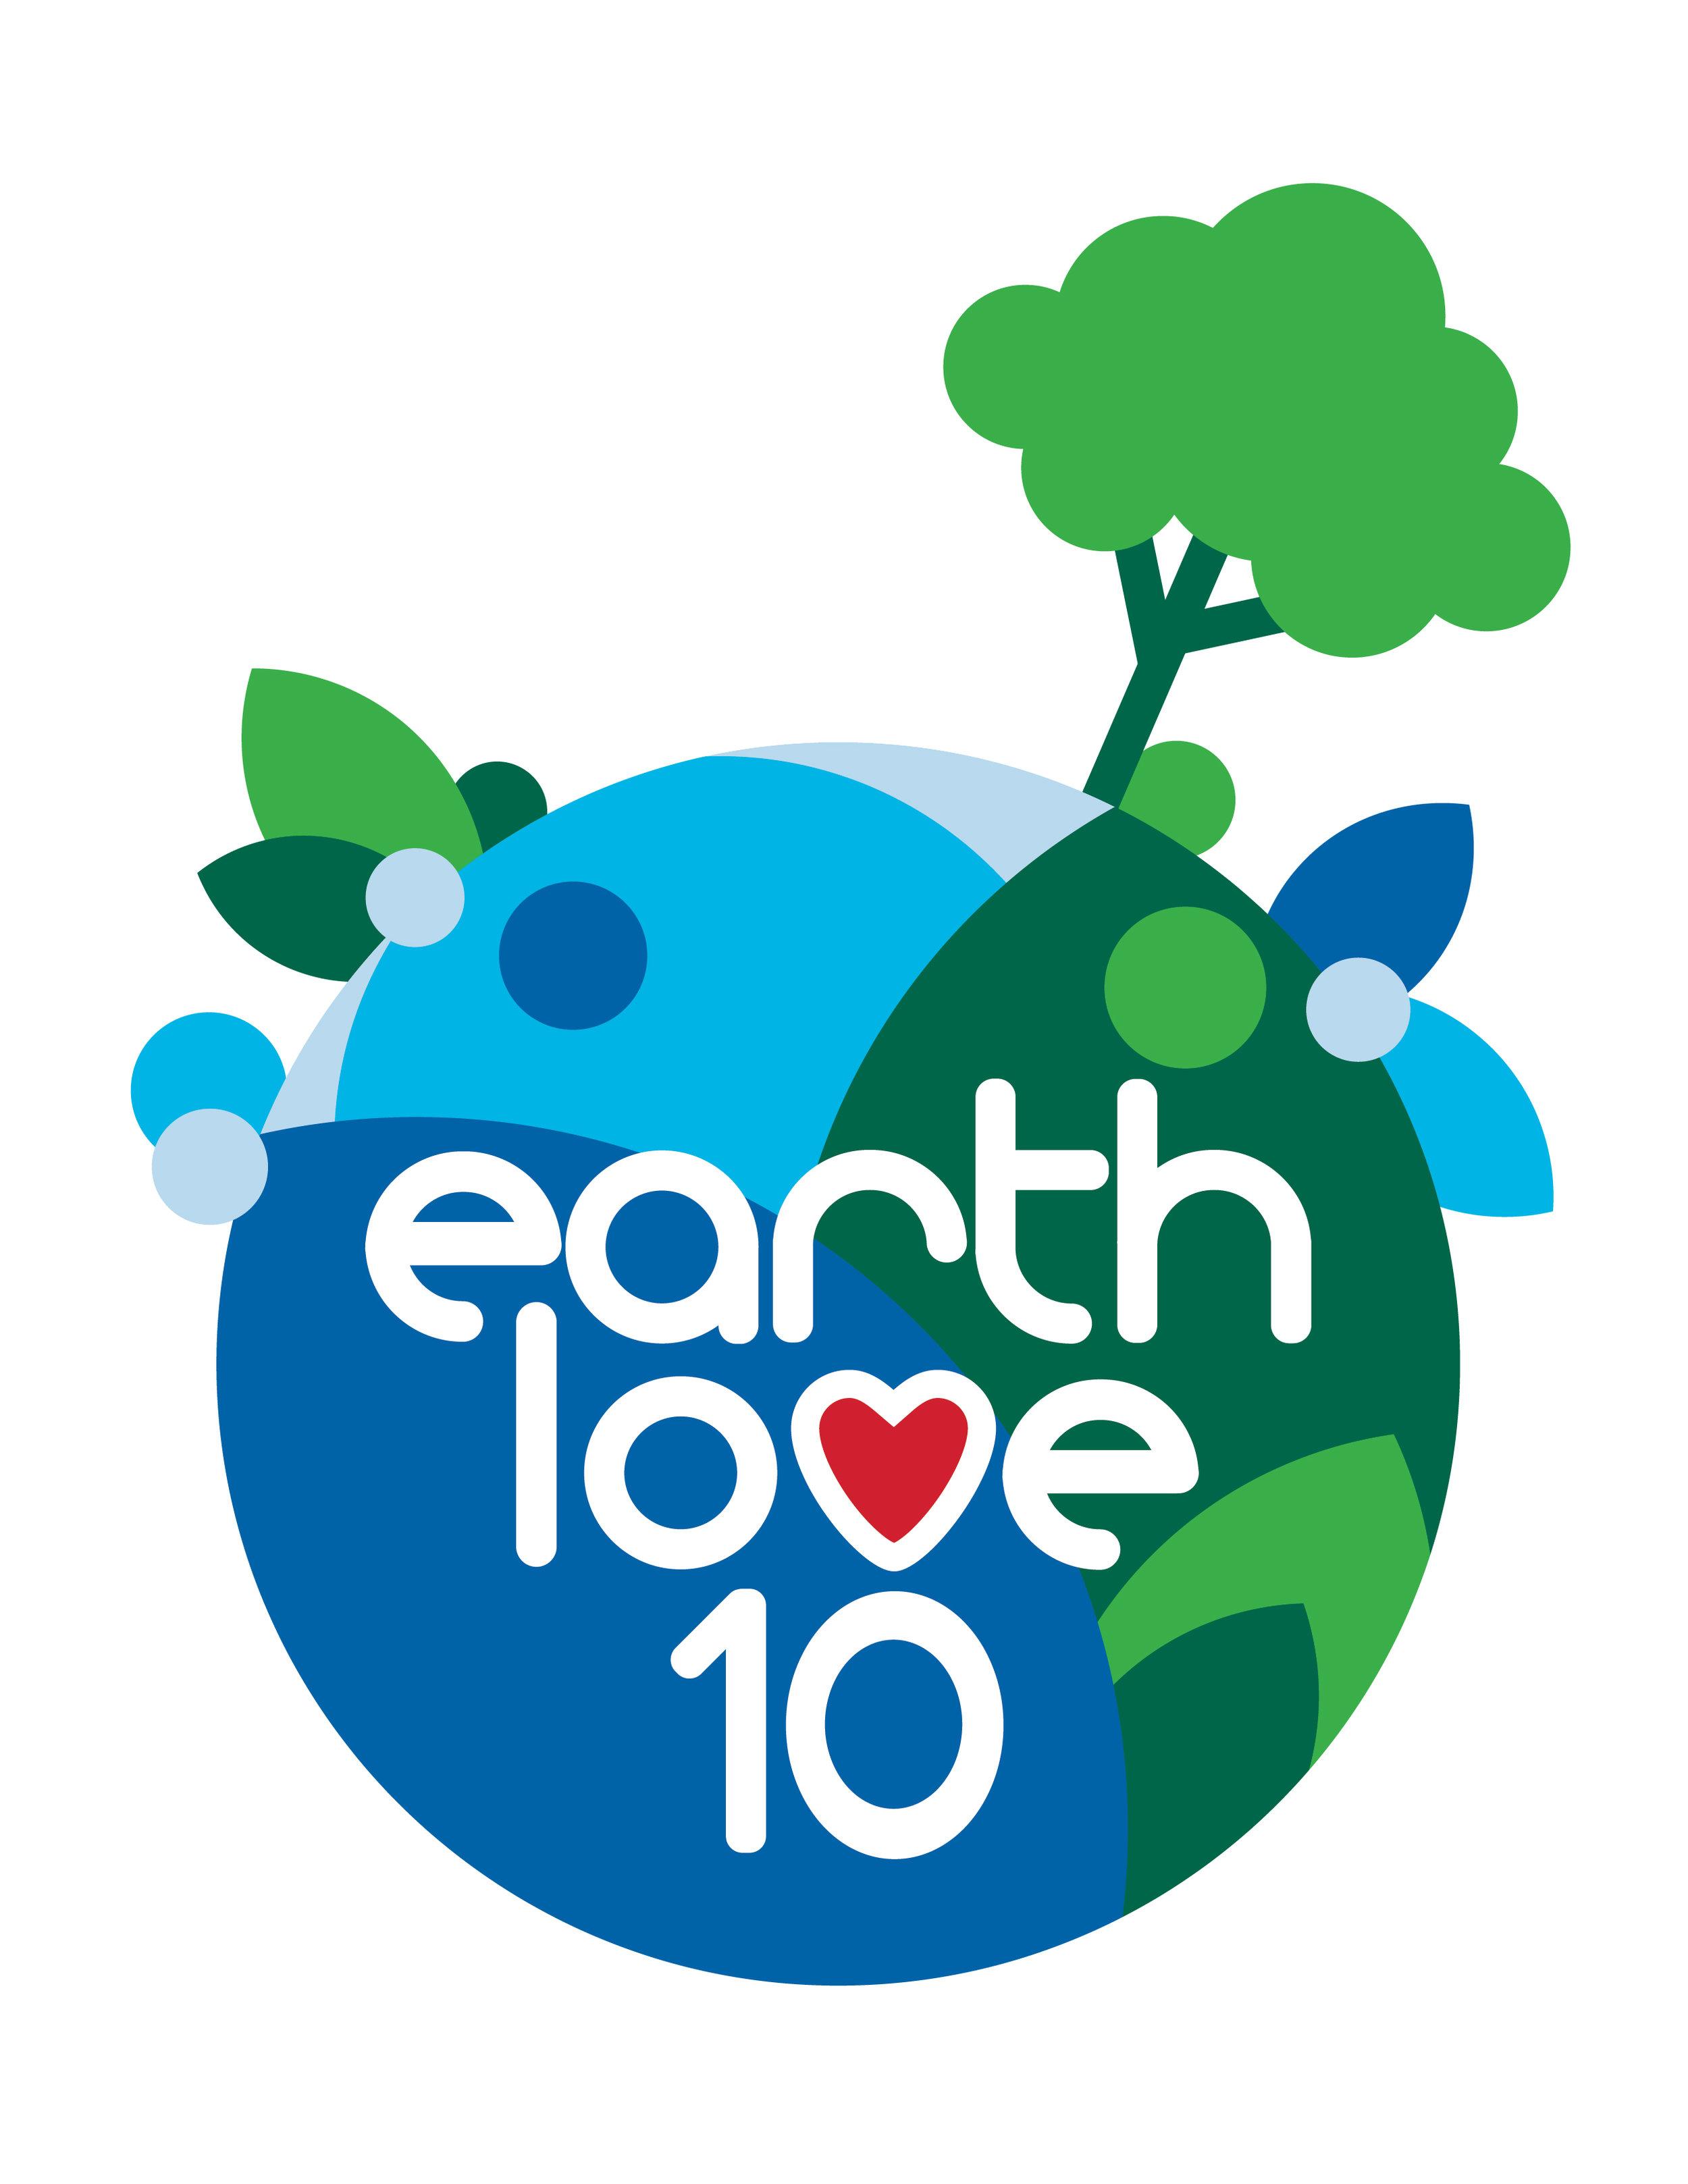 Earth Love 10 layer 03_Full Logo.jpg